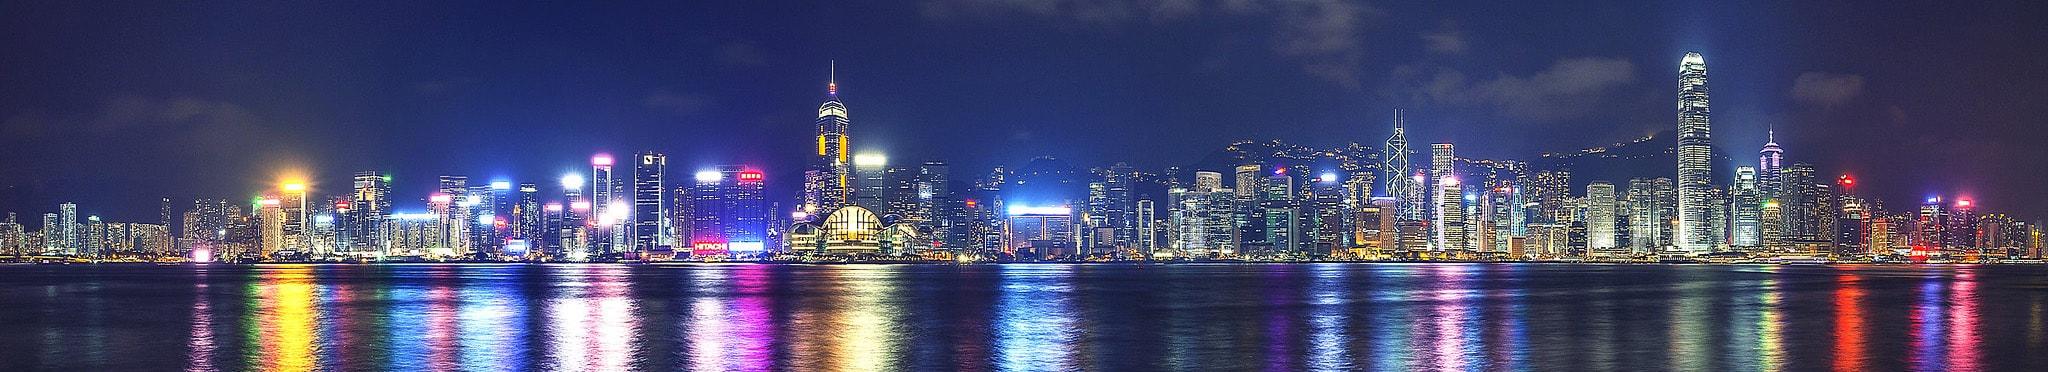 Огни Гонконга<br> Гонконг